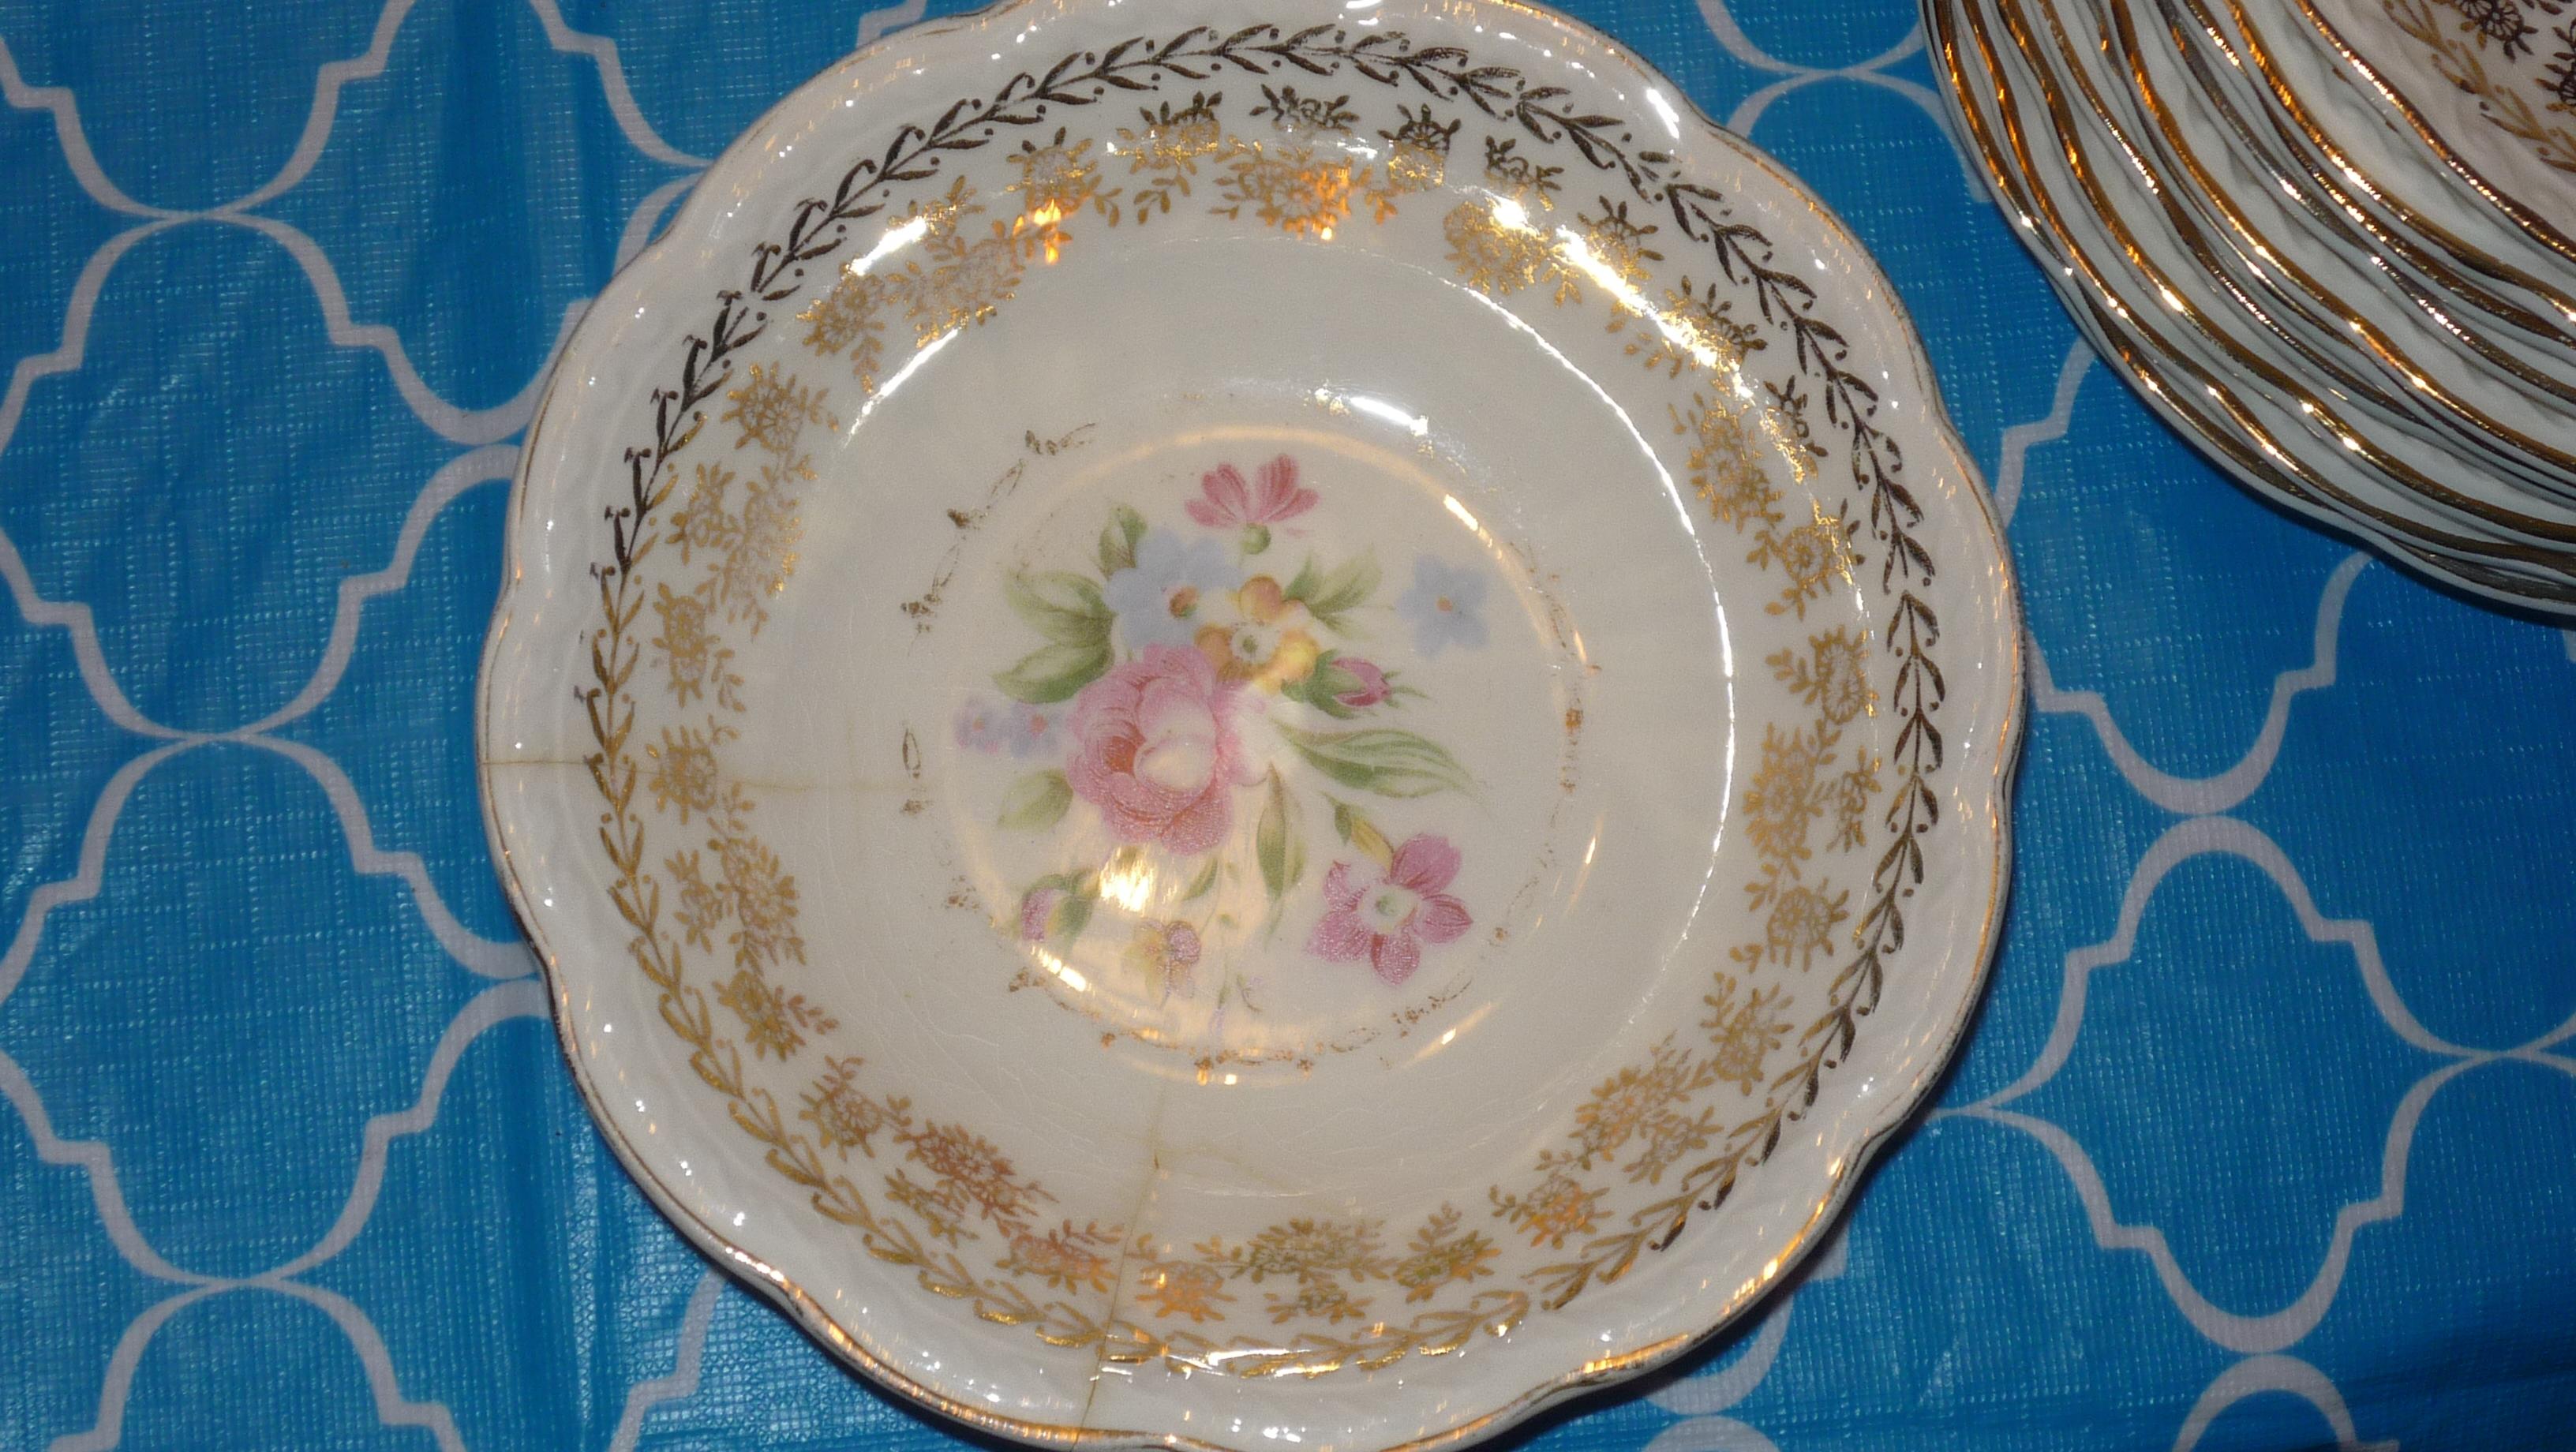 American Beauty by Stetson 22kt gold 78 piece dinnerware antique ...